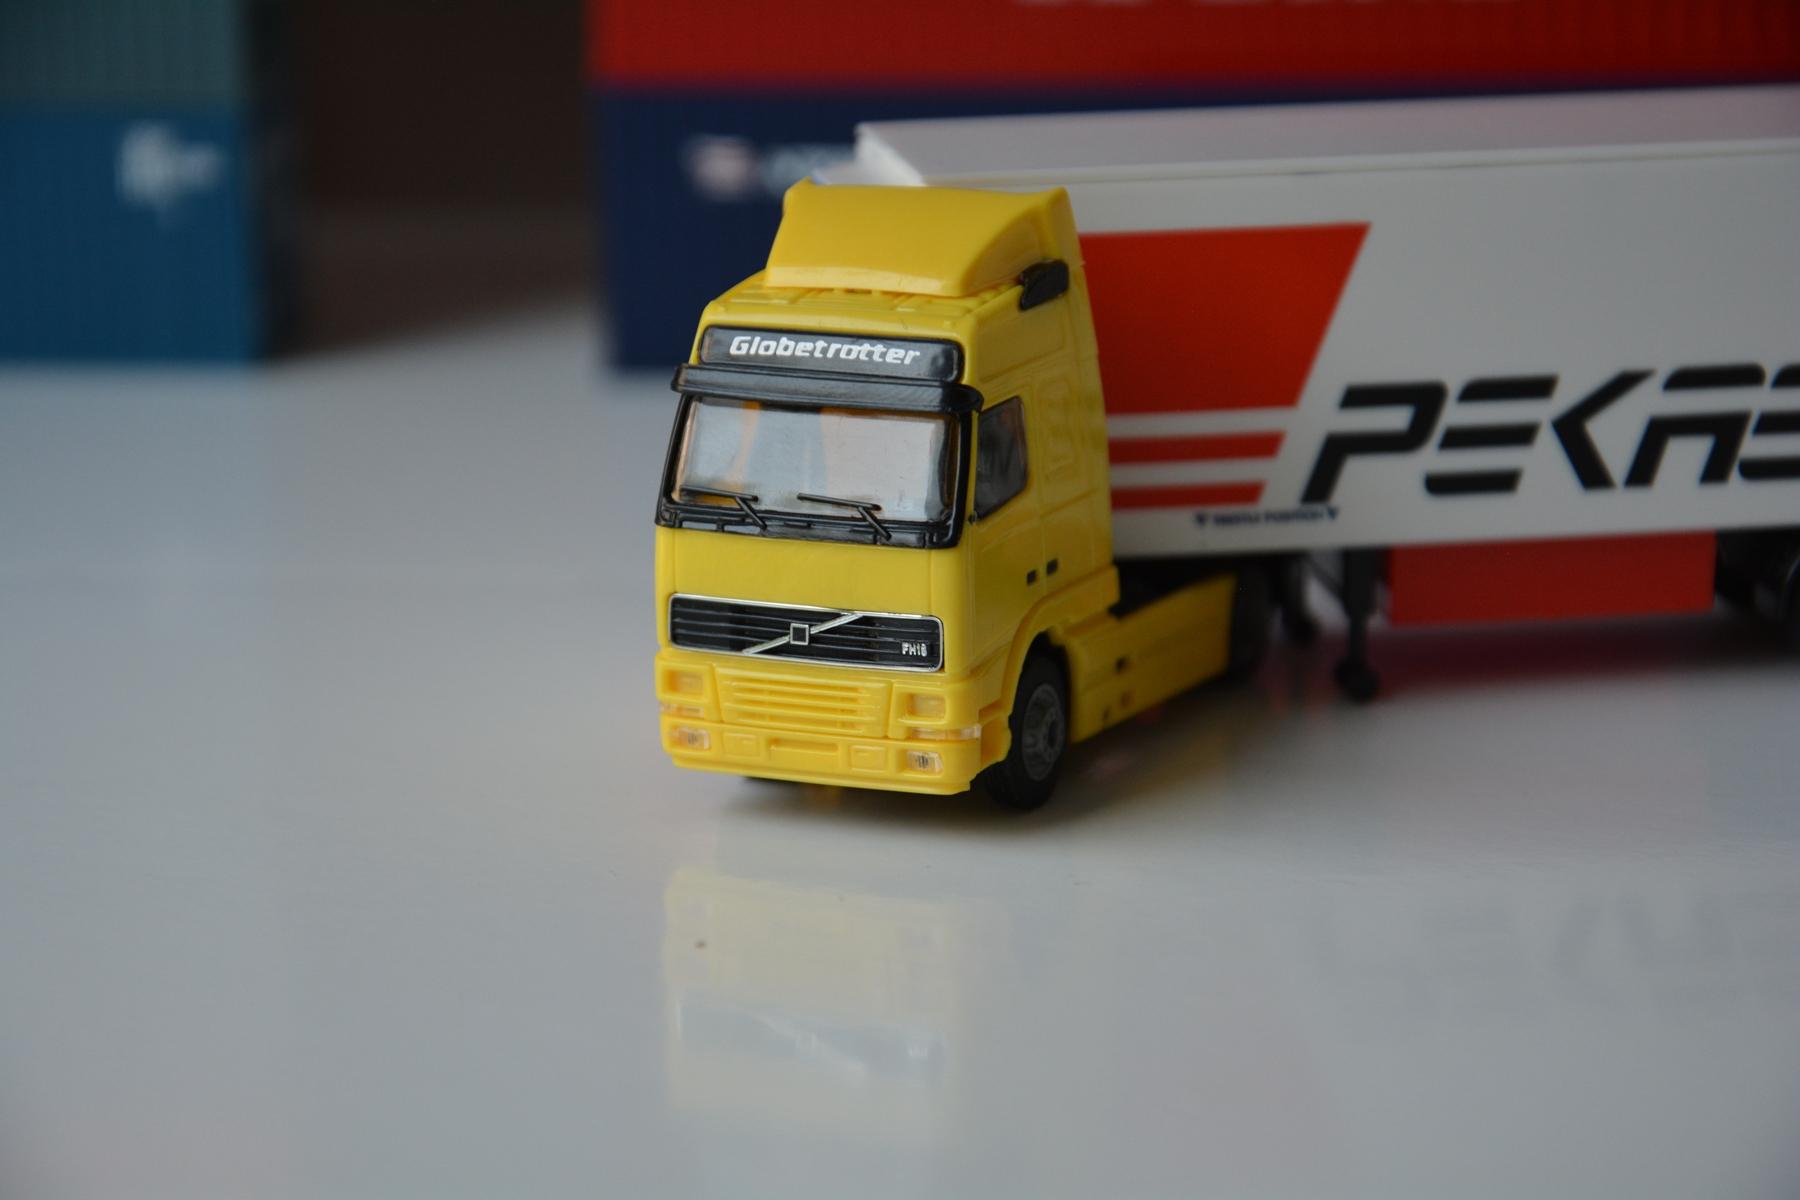 DSC_3998.JPG